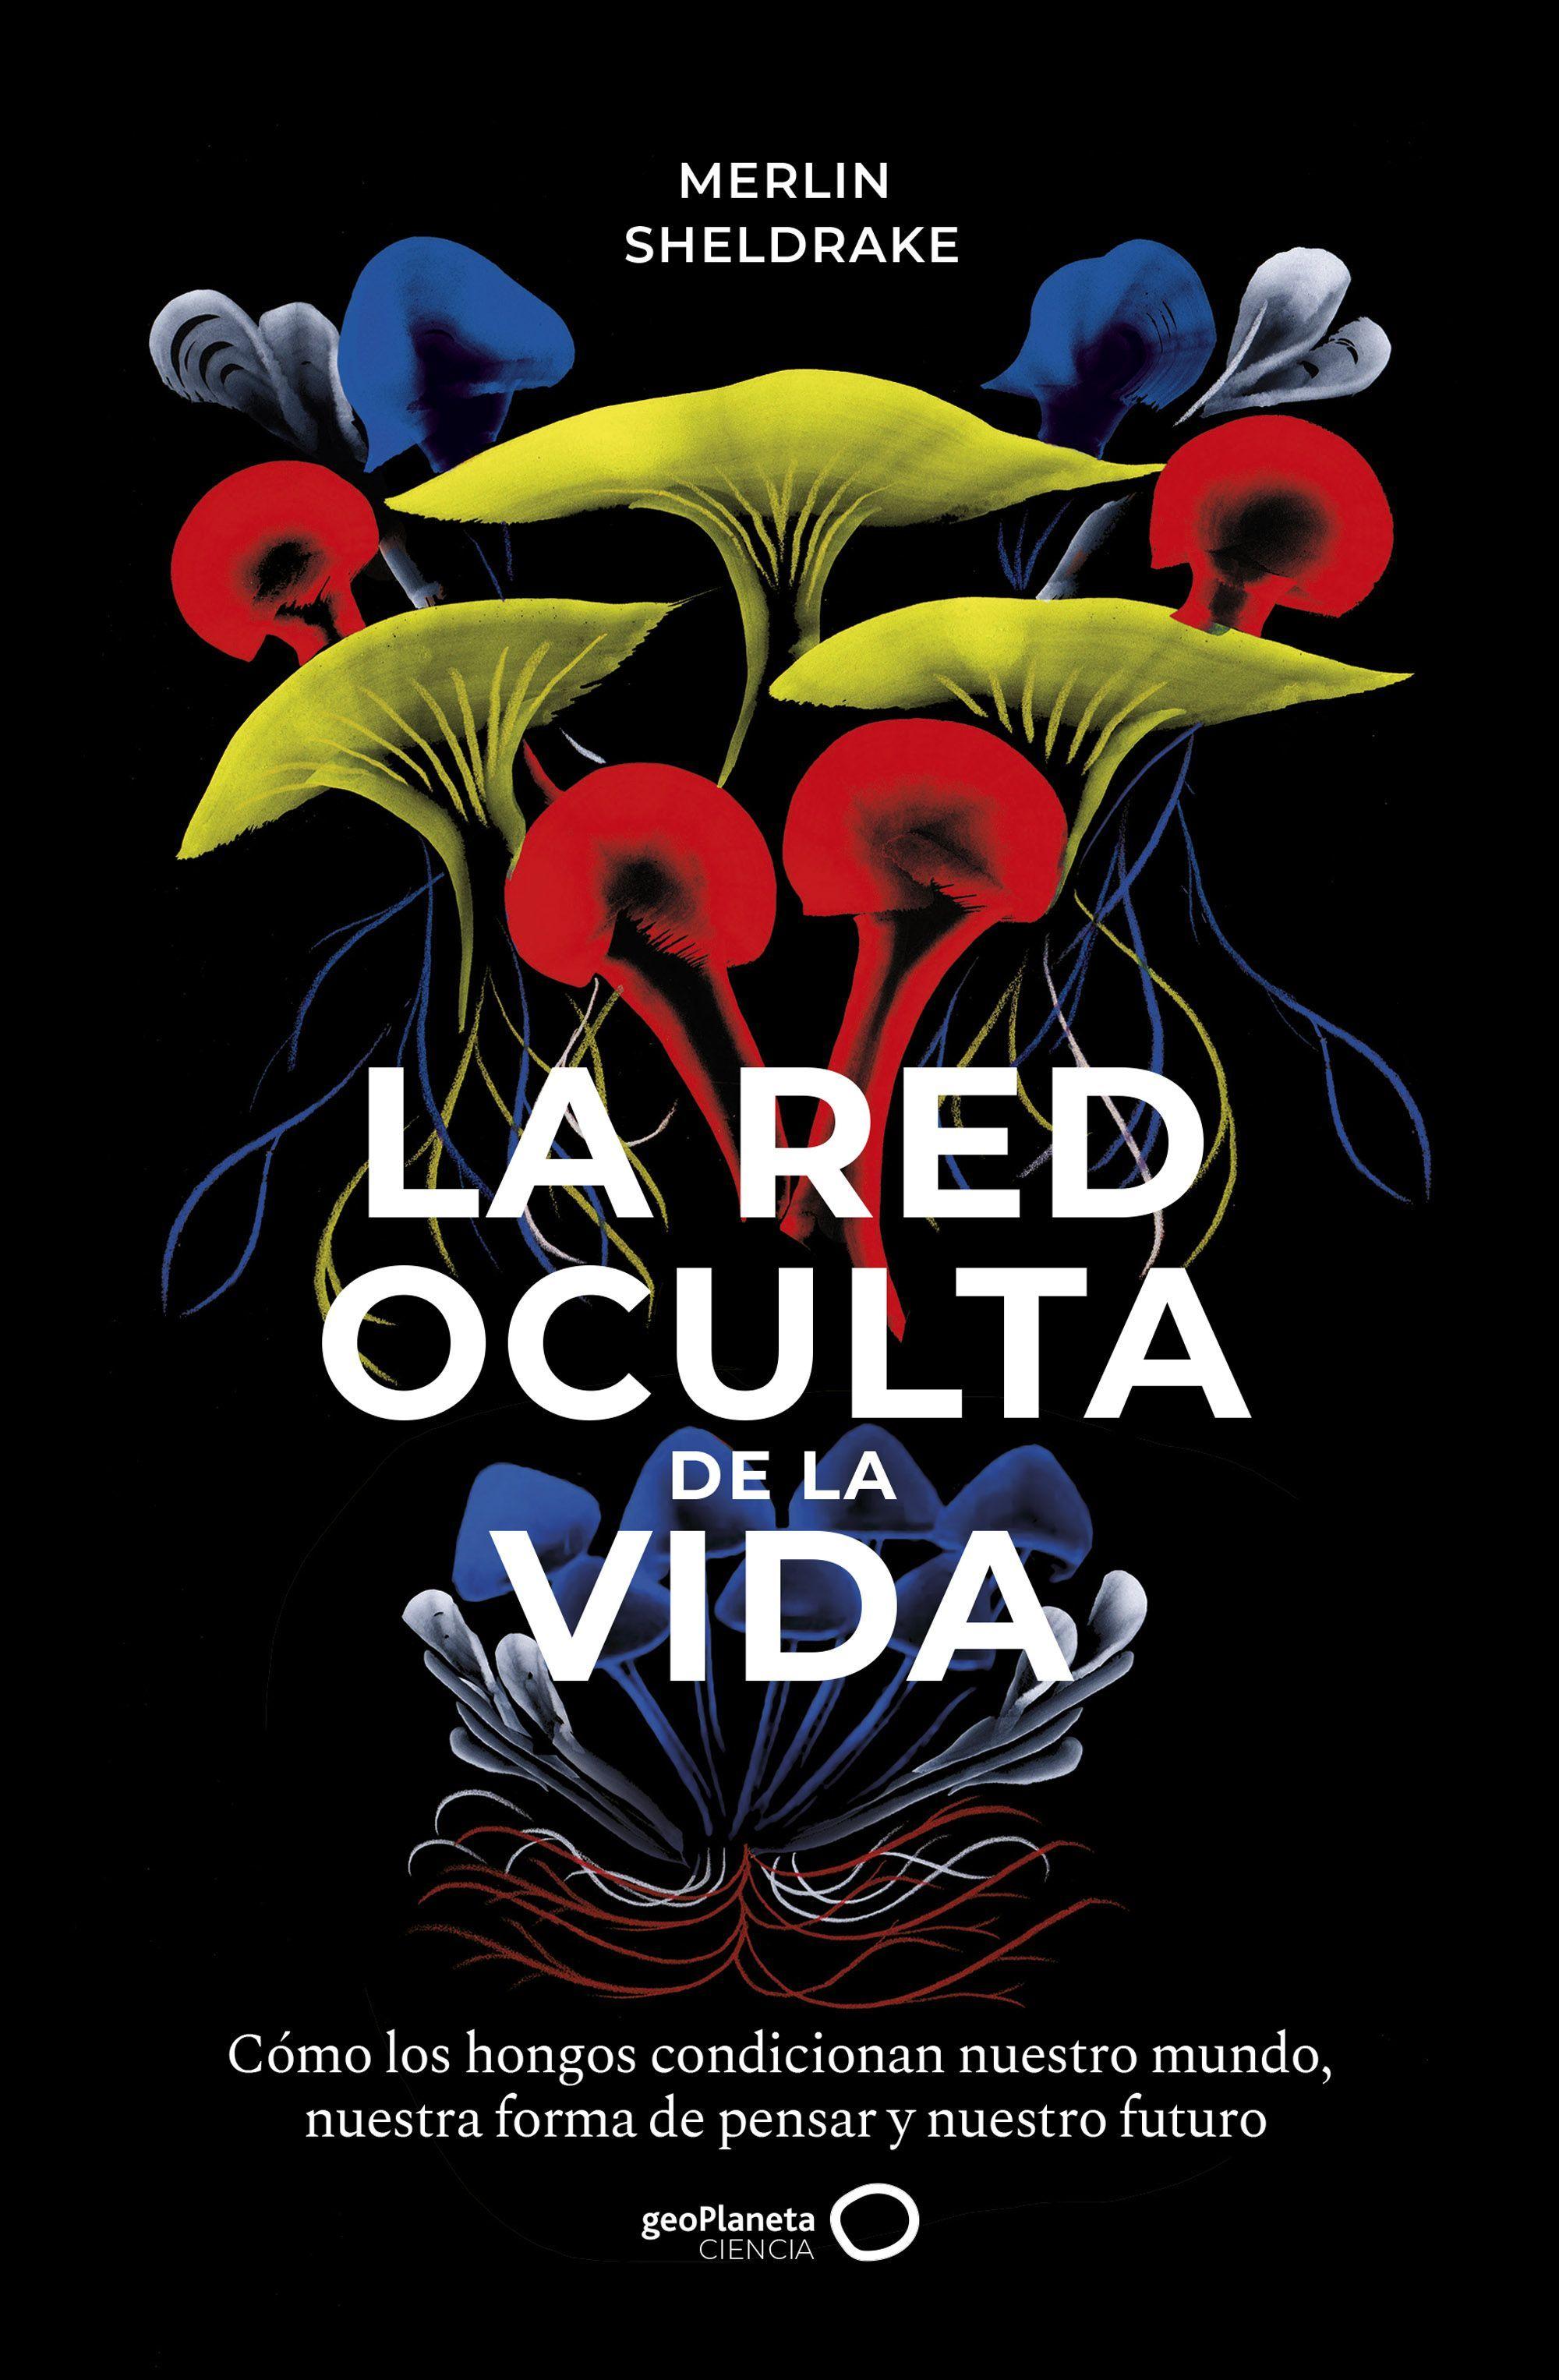 RED OCULTA DE LA VIDA LA